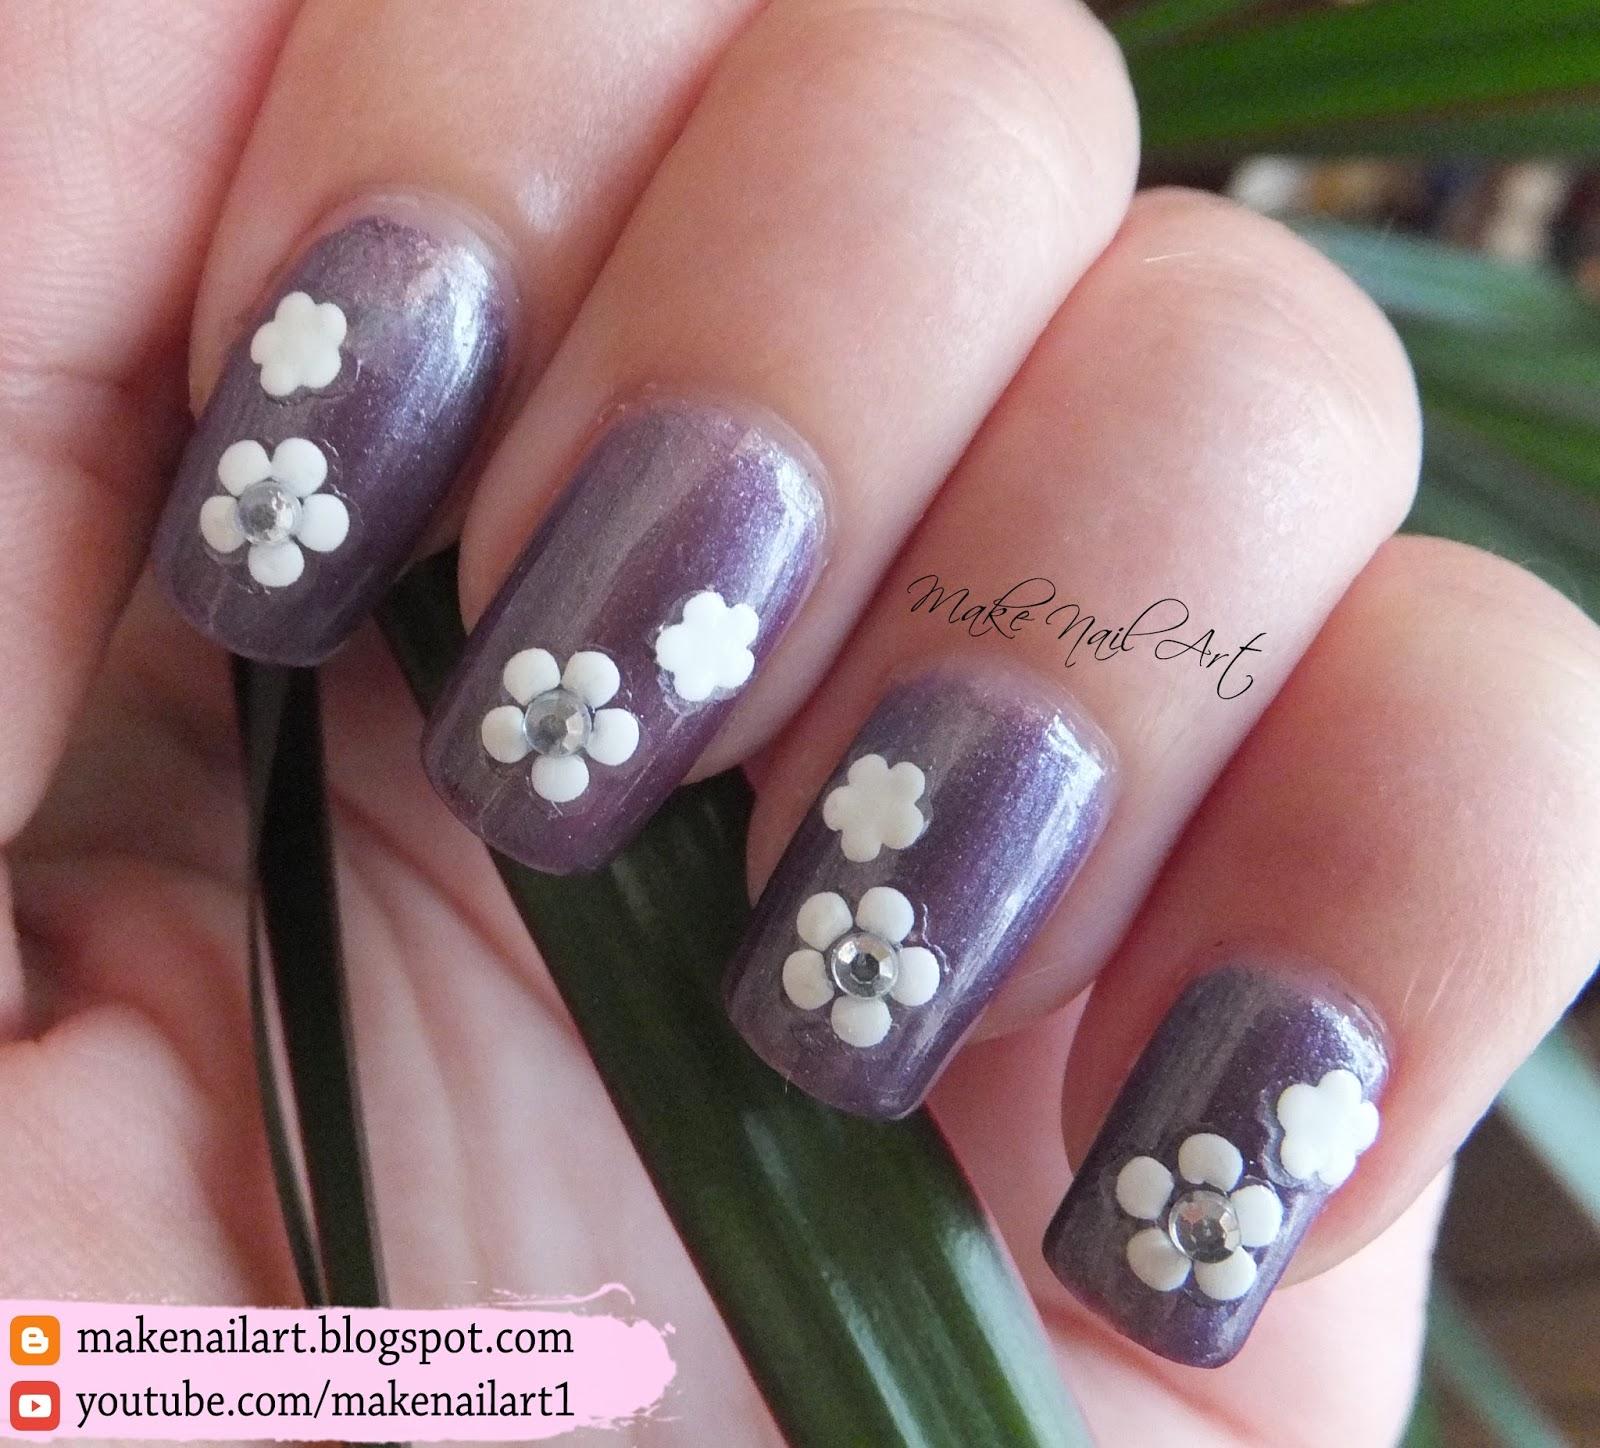 Make Nail Art Flower Decals Nail Art Design 31dc2016